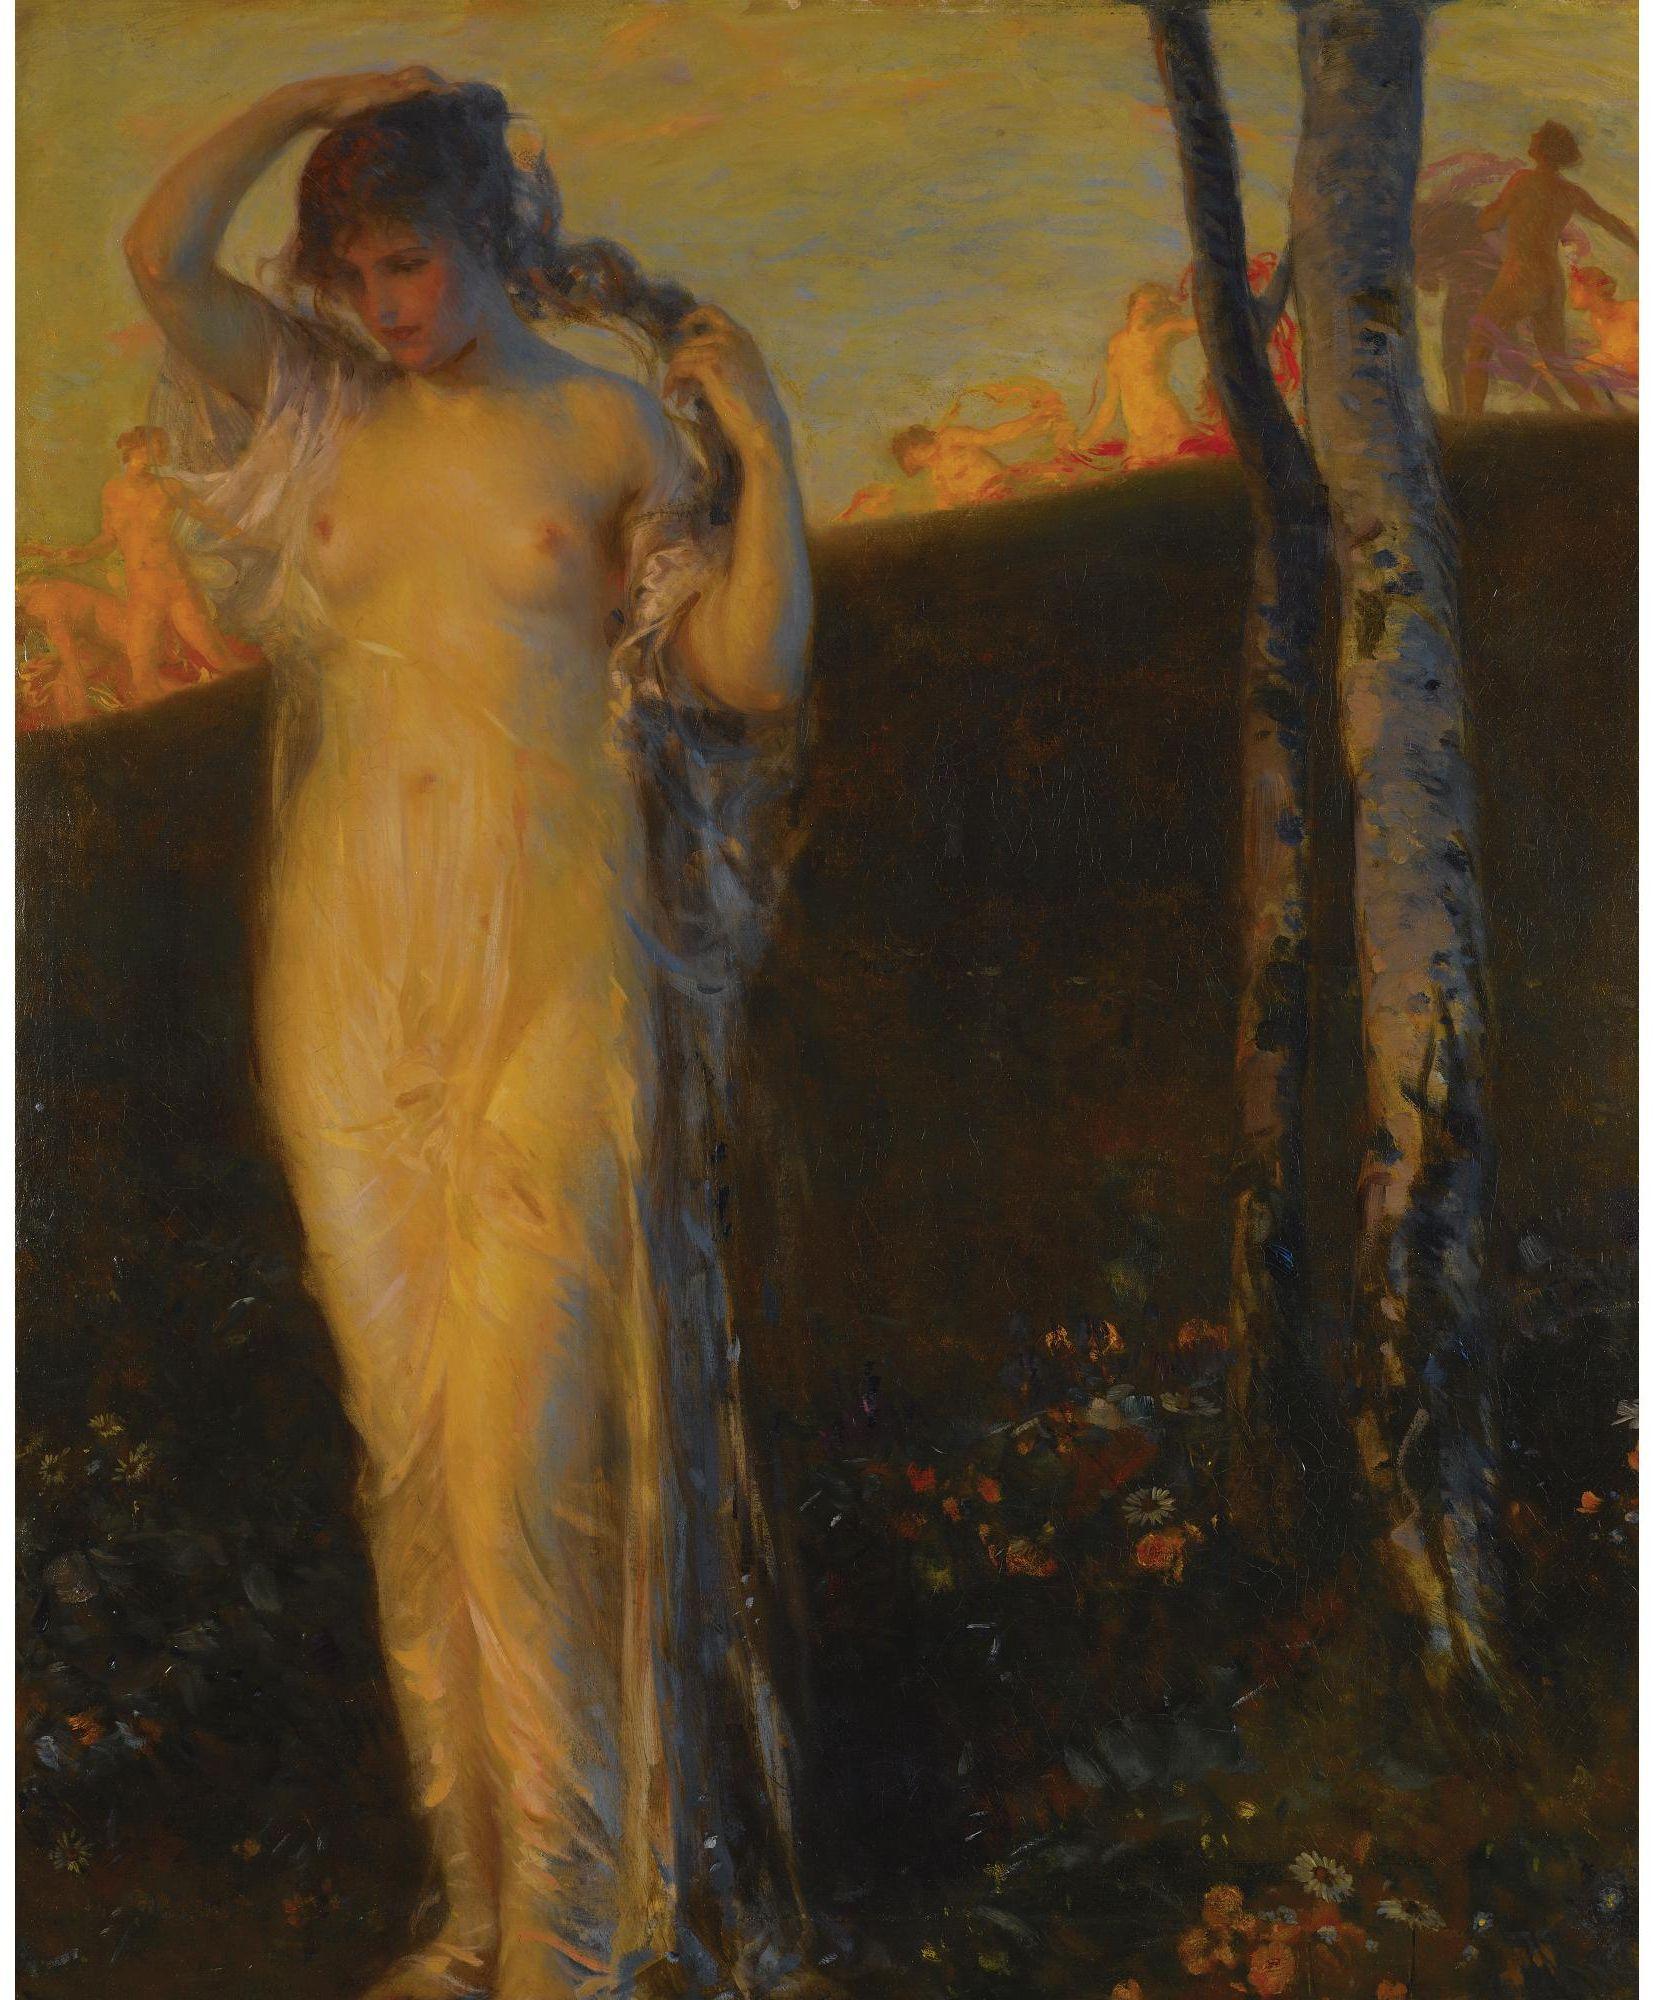 Carl von Marr, 1858-1936. Бичевание. 107.3 х 88.2 см. Частная коллекция